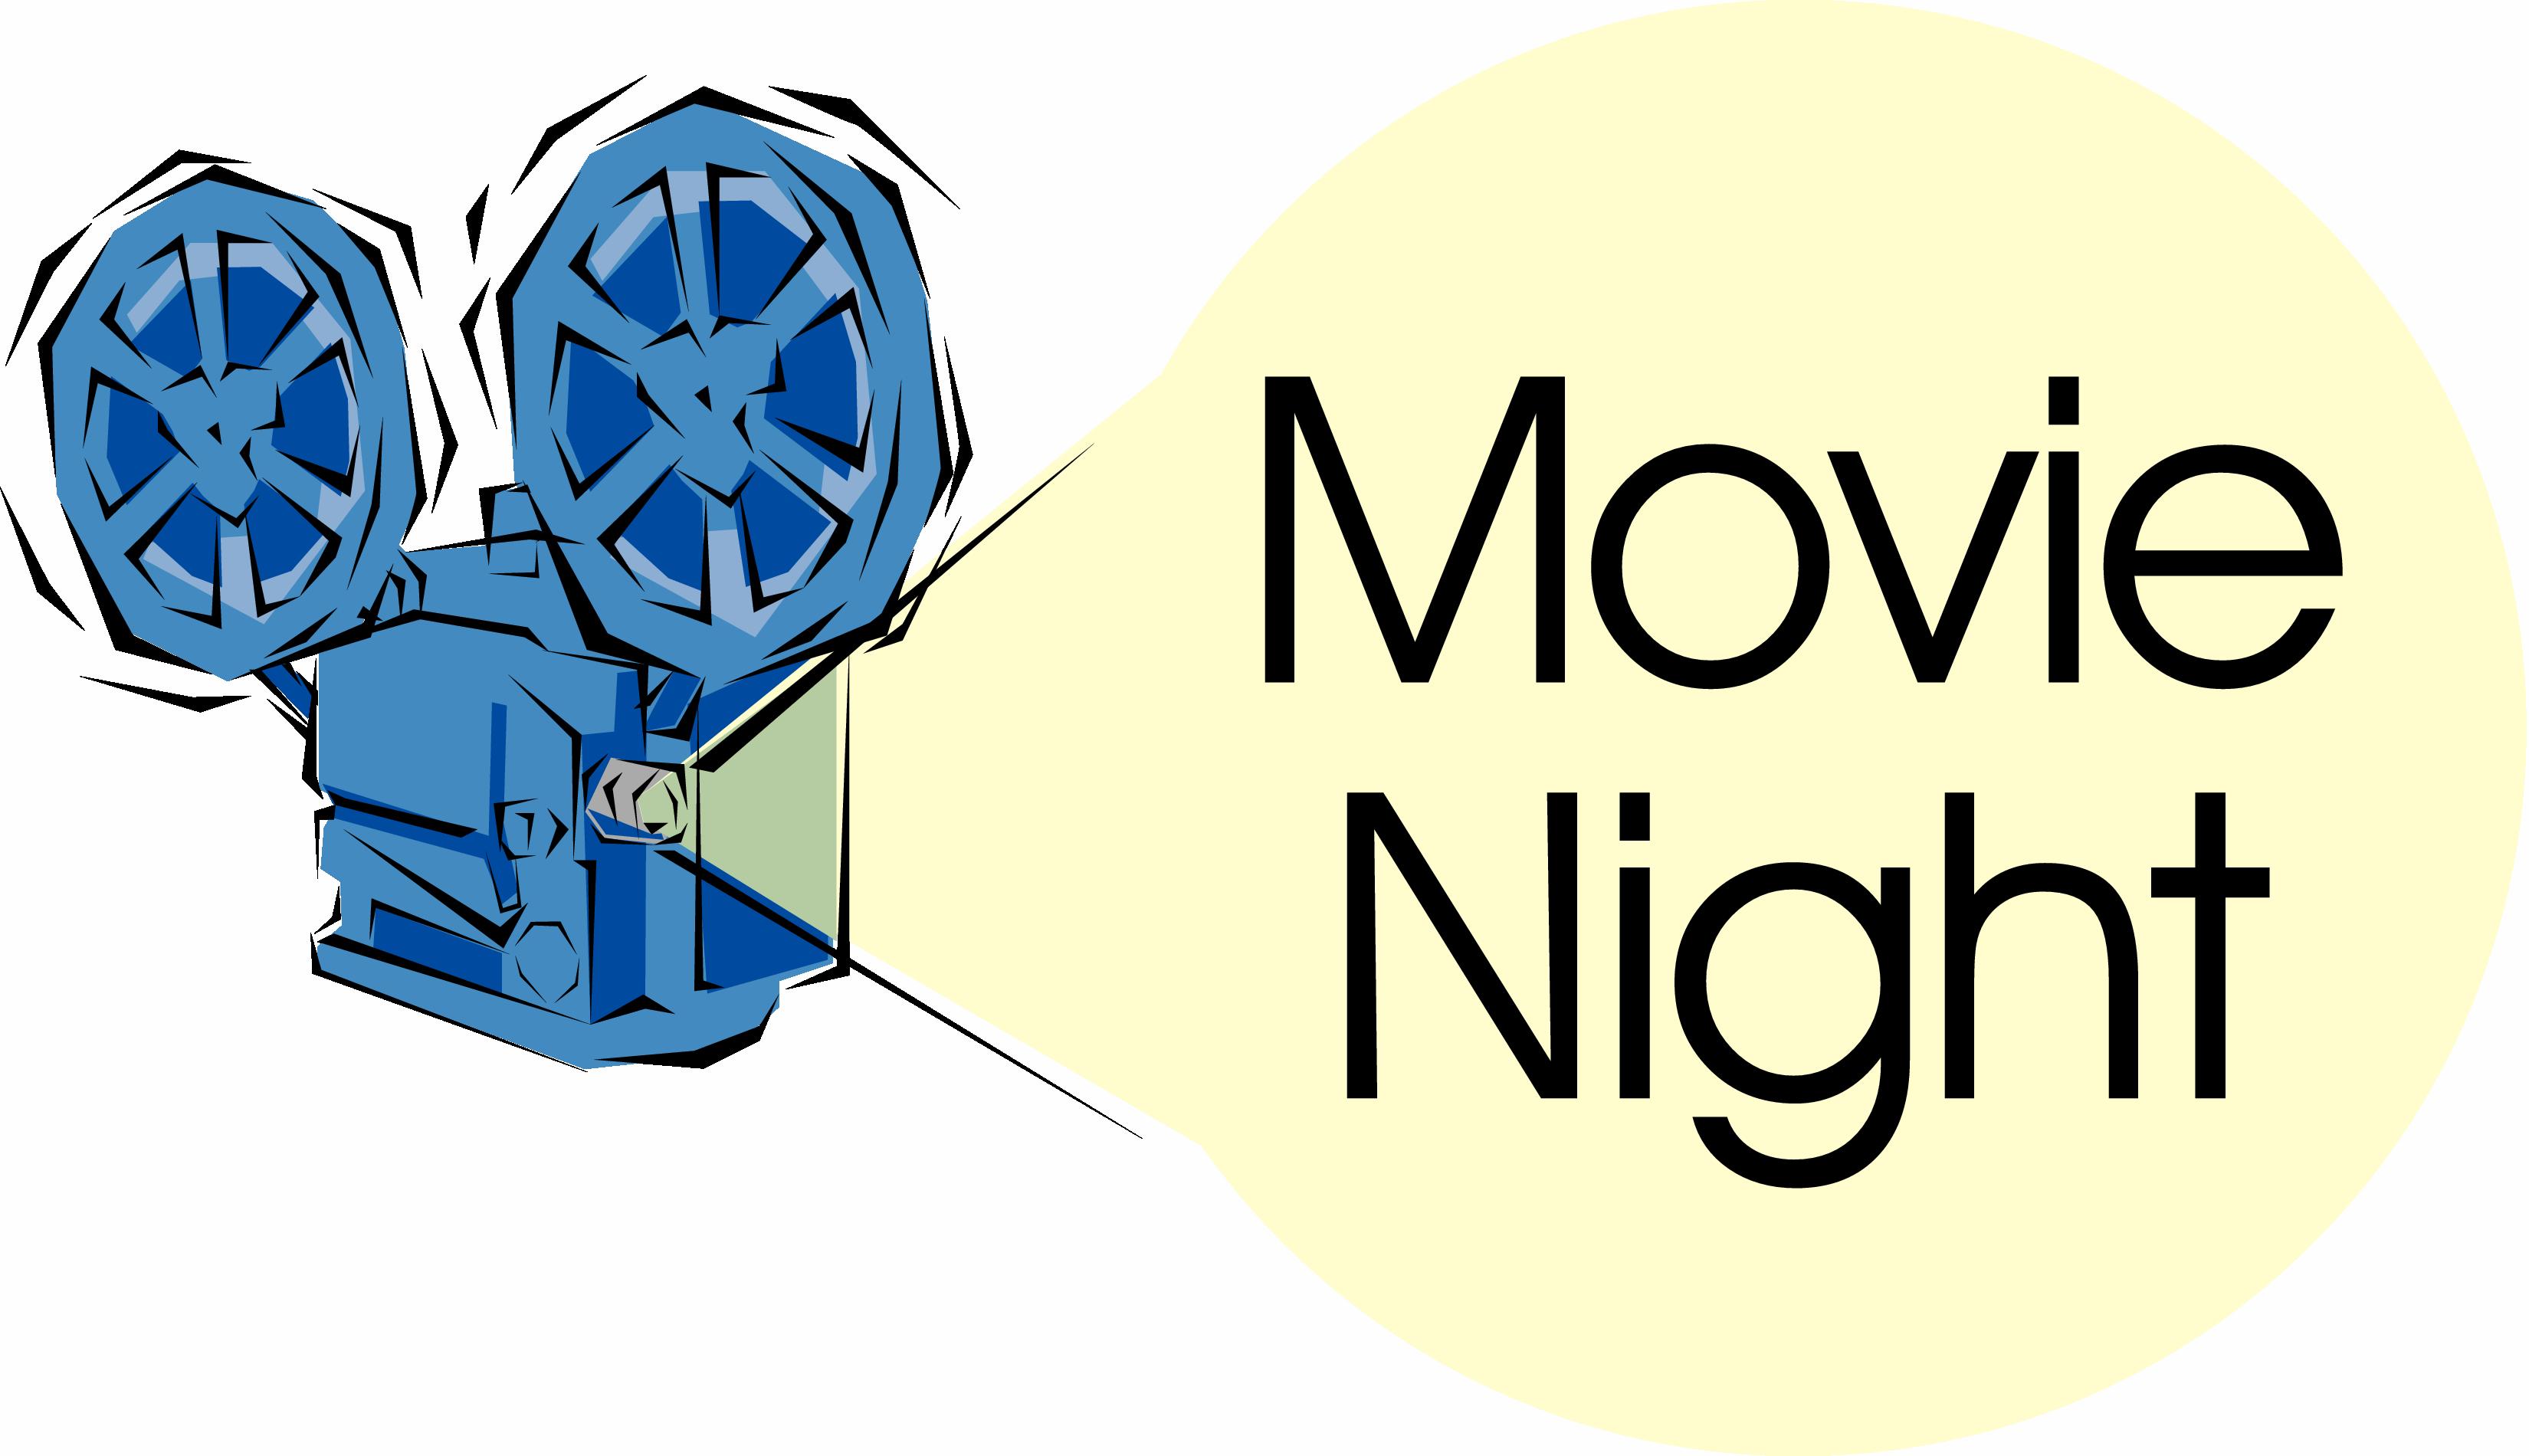 Movie night clip art 5 2